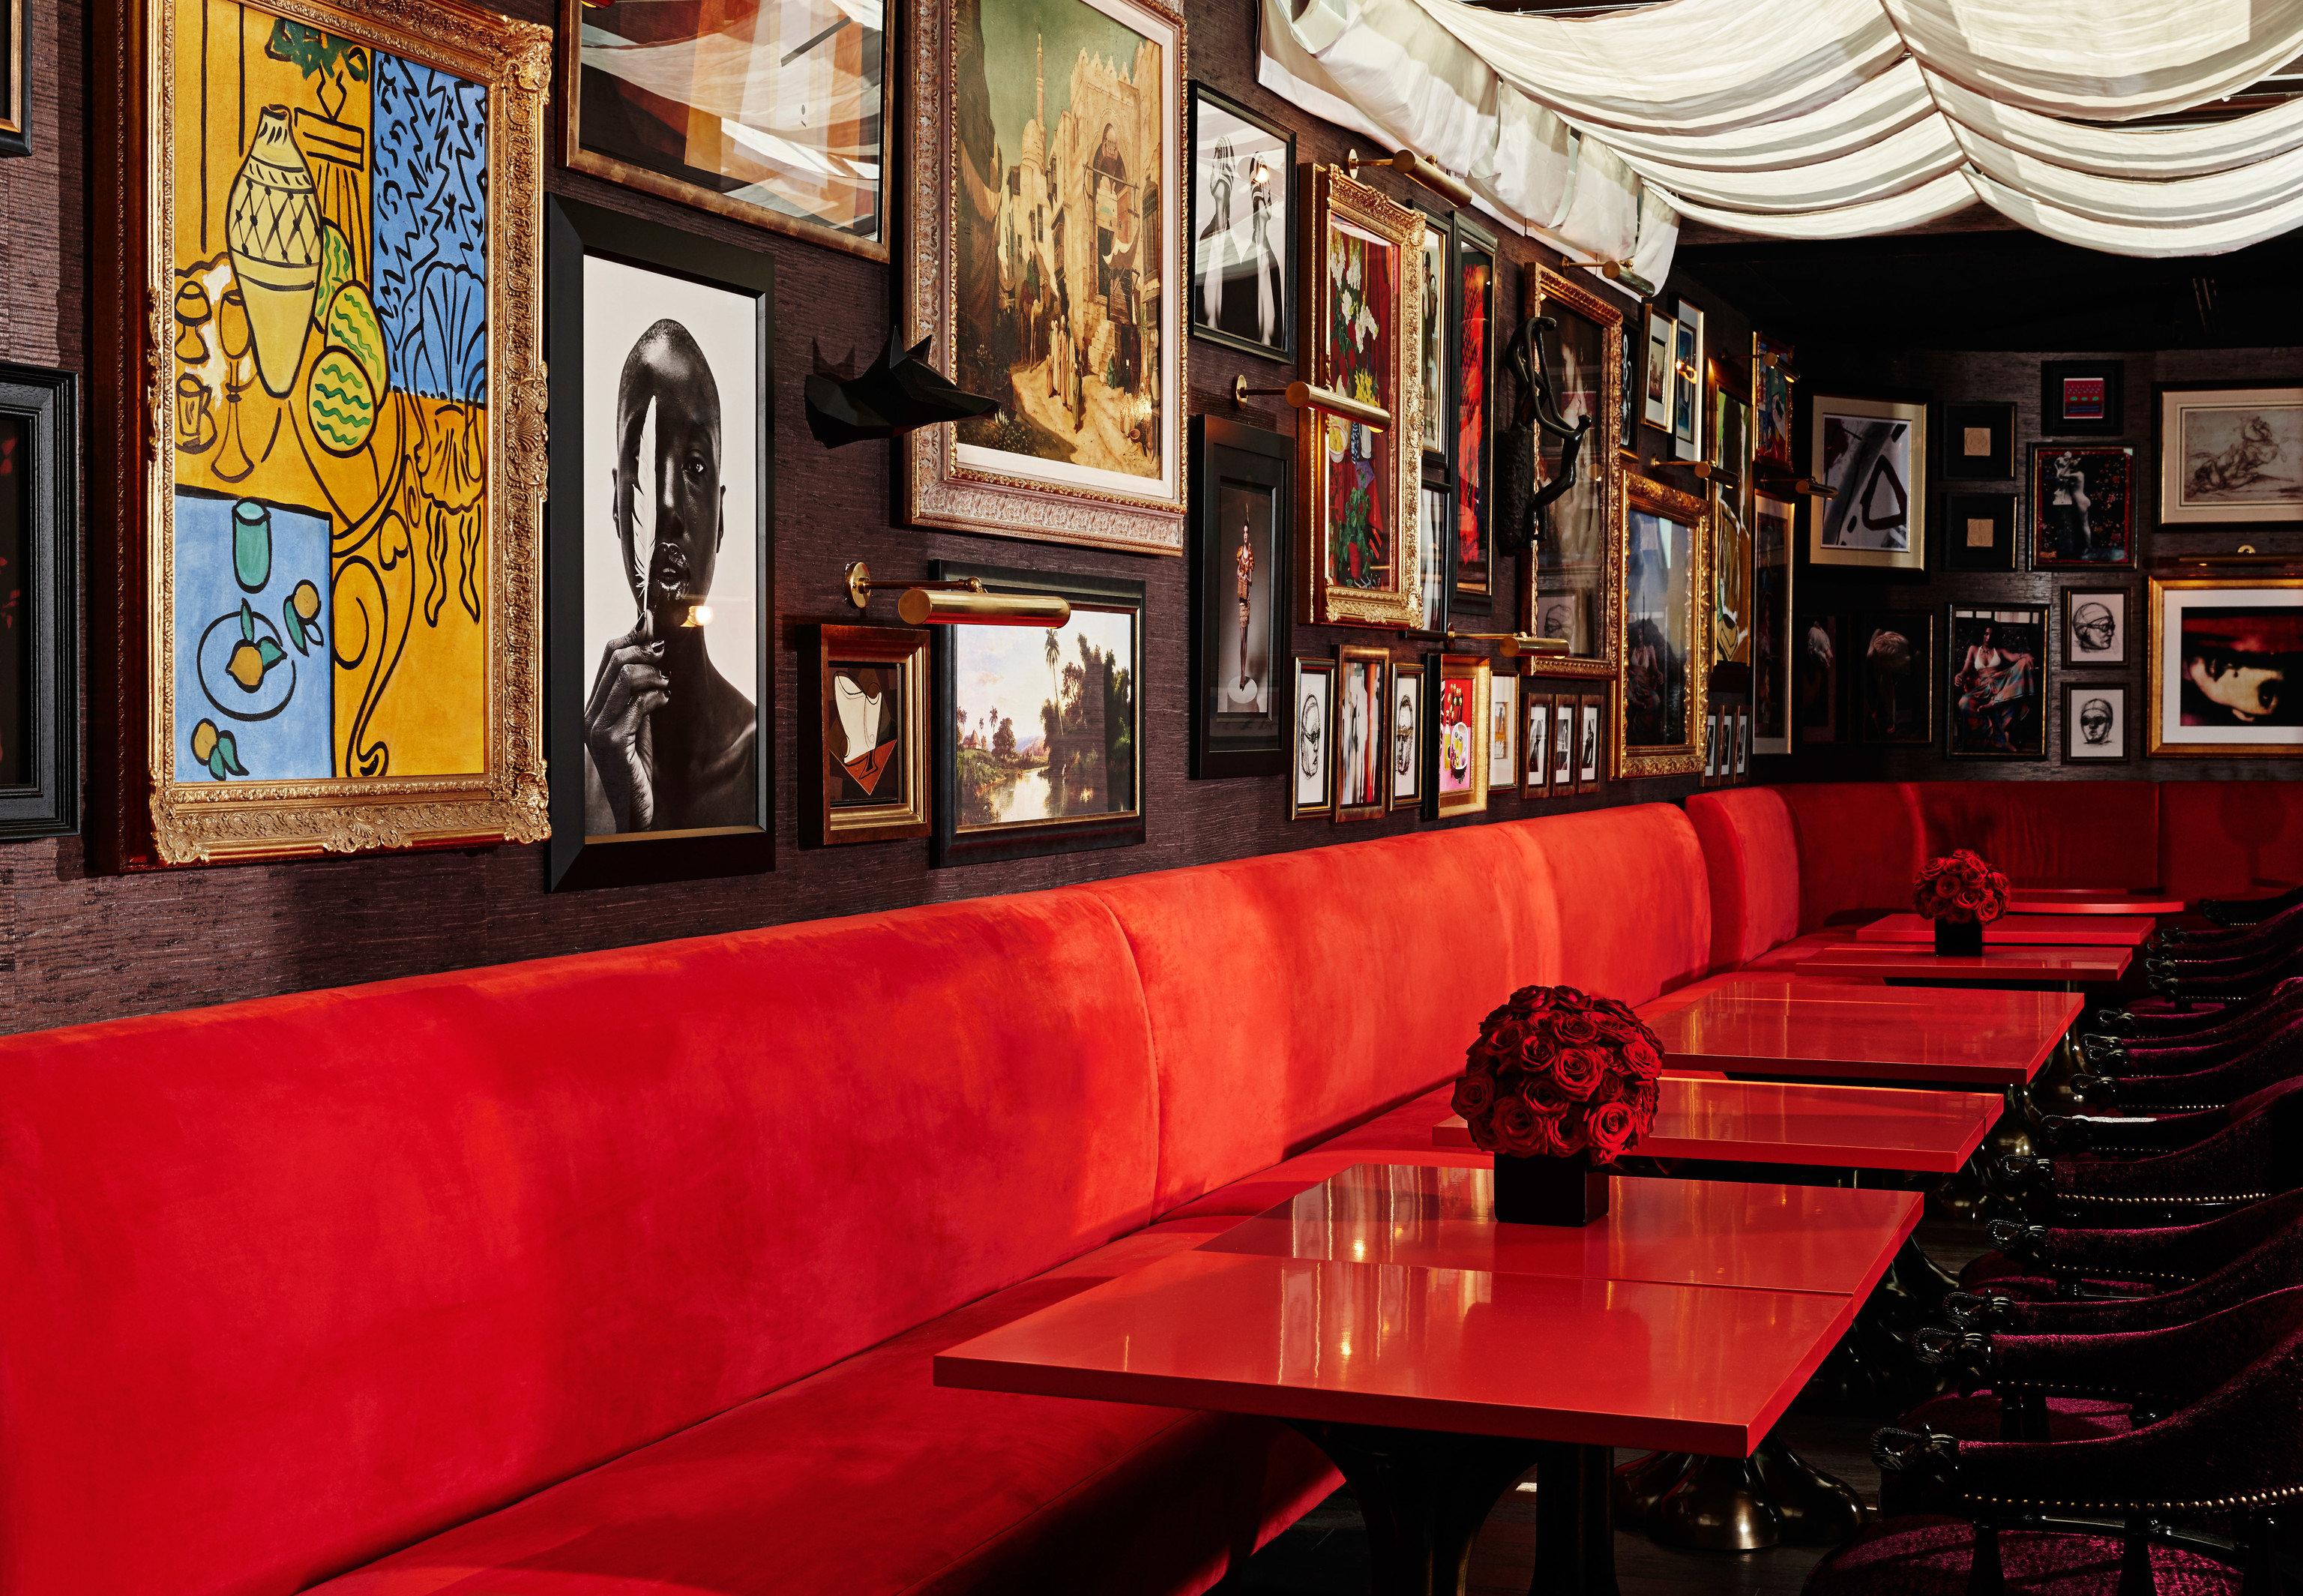 Hotels indoor Bar restaurant red interior design